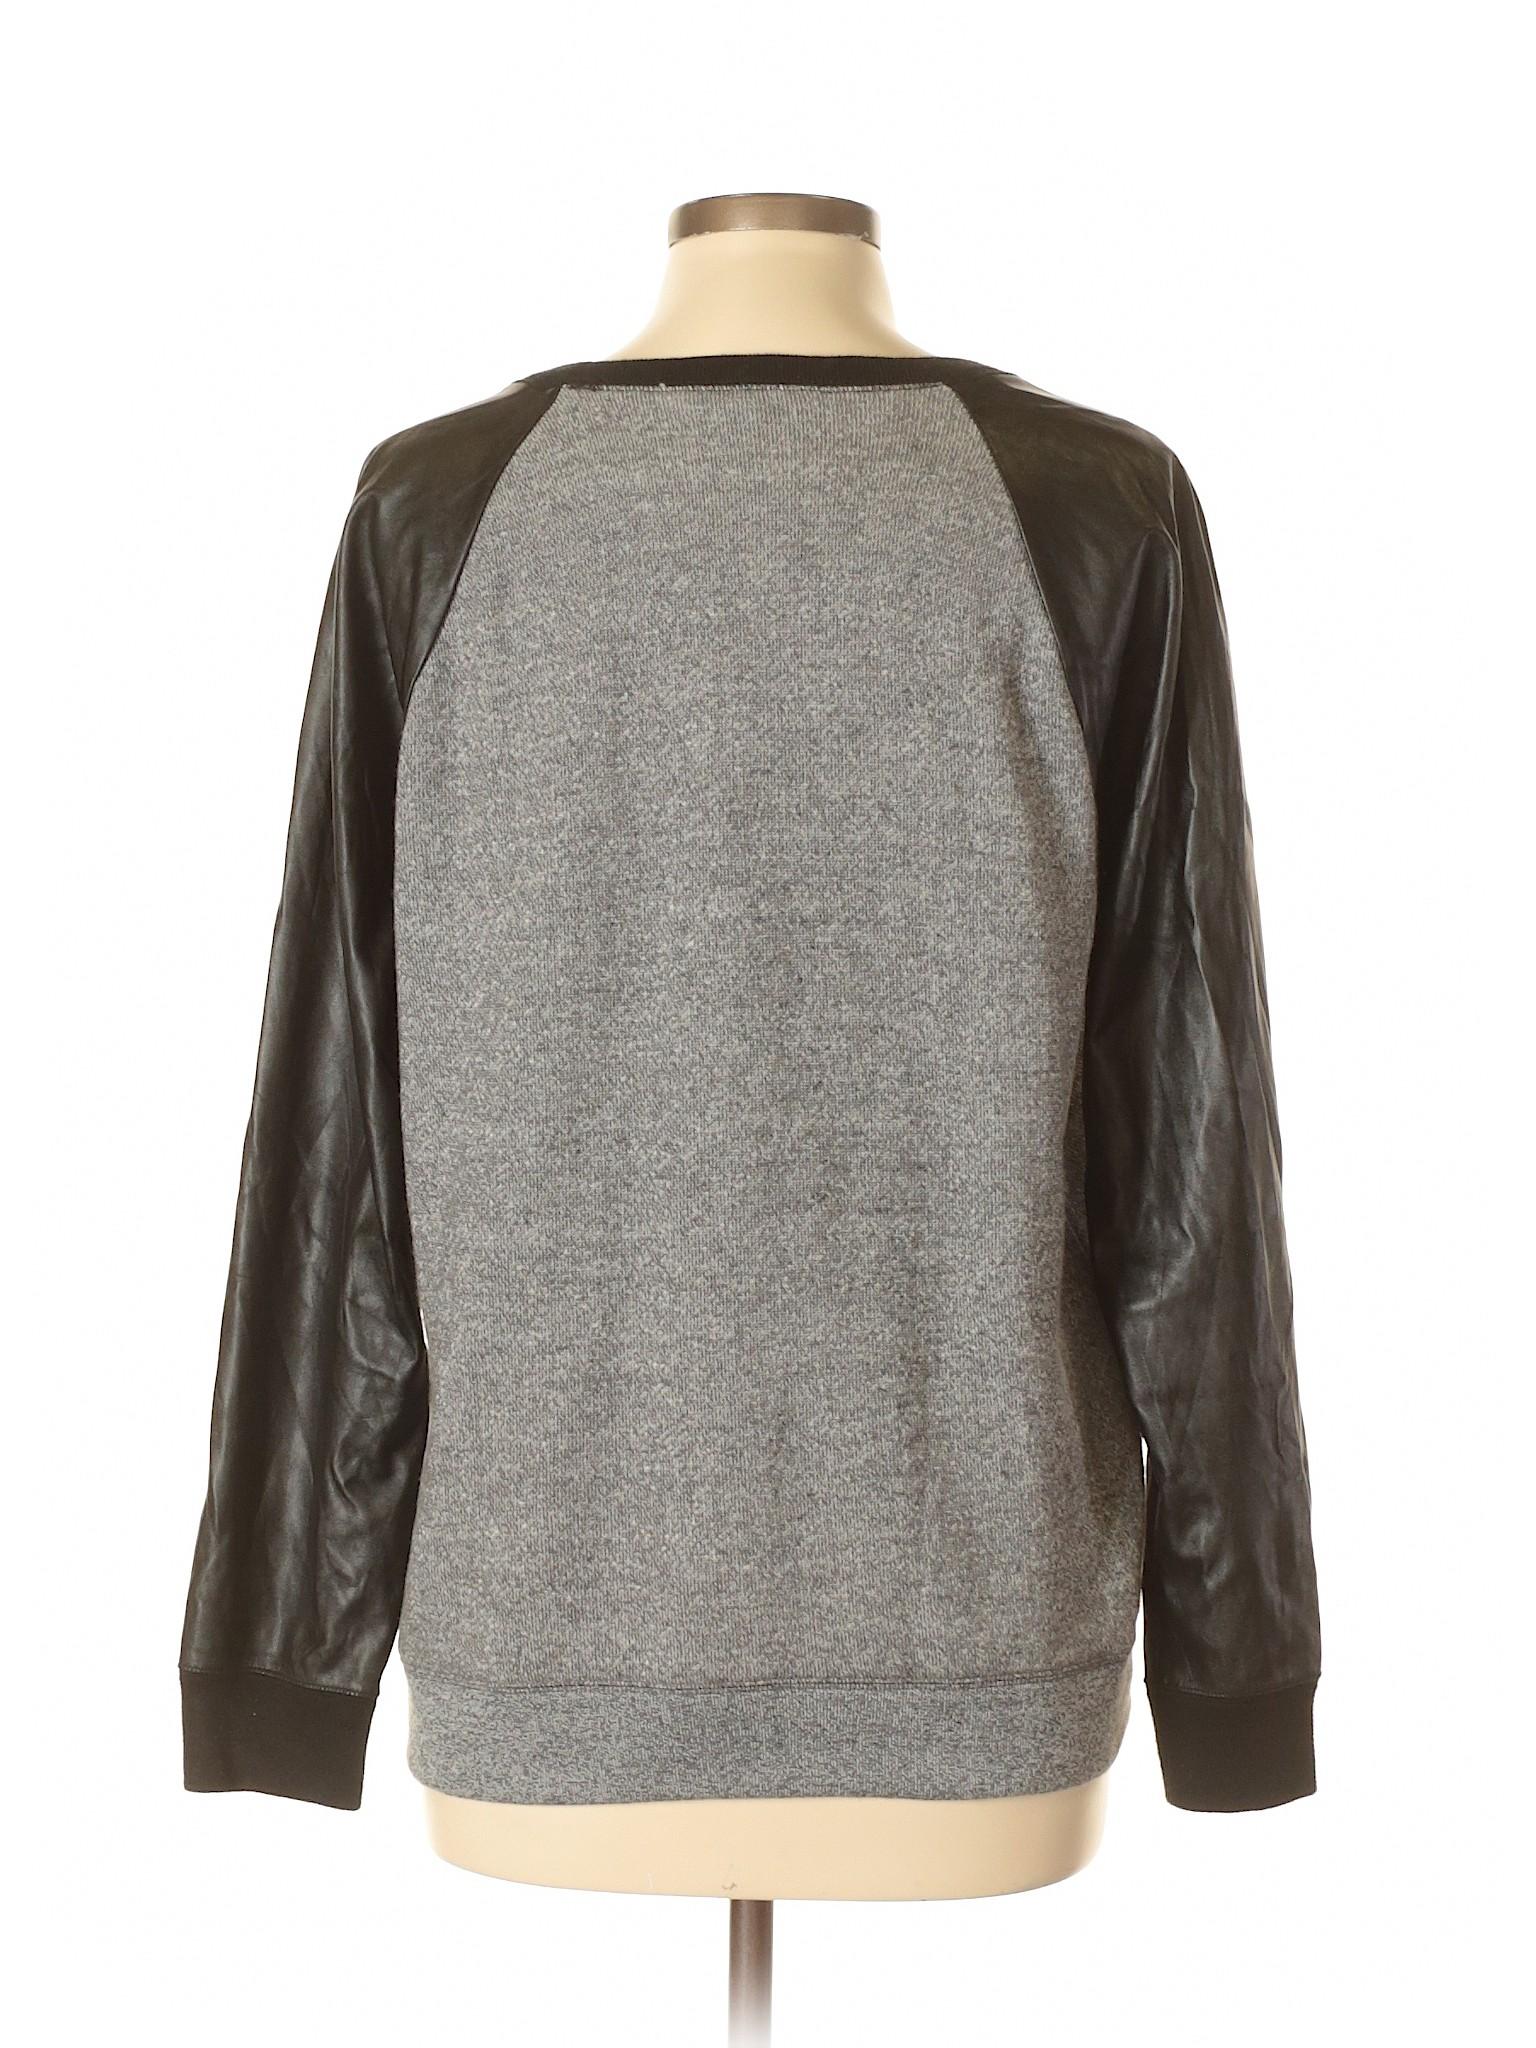 Secret Boutique Boutique Victoria's Pullover Victoria's Sweater ztPFxqtw